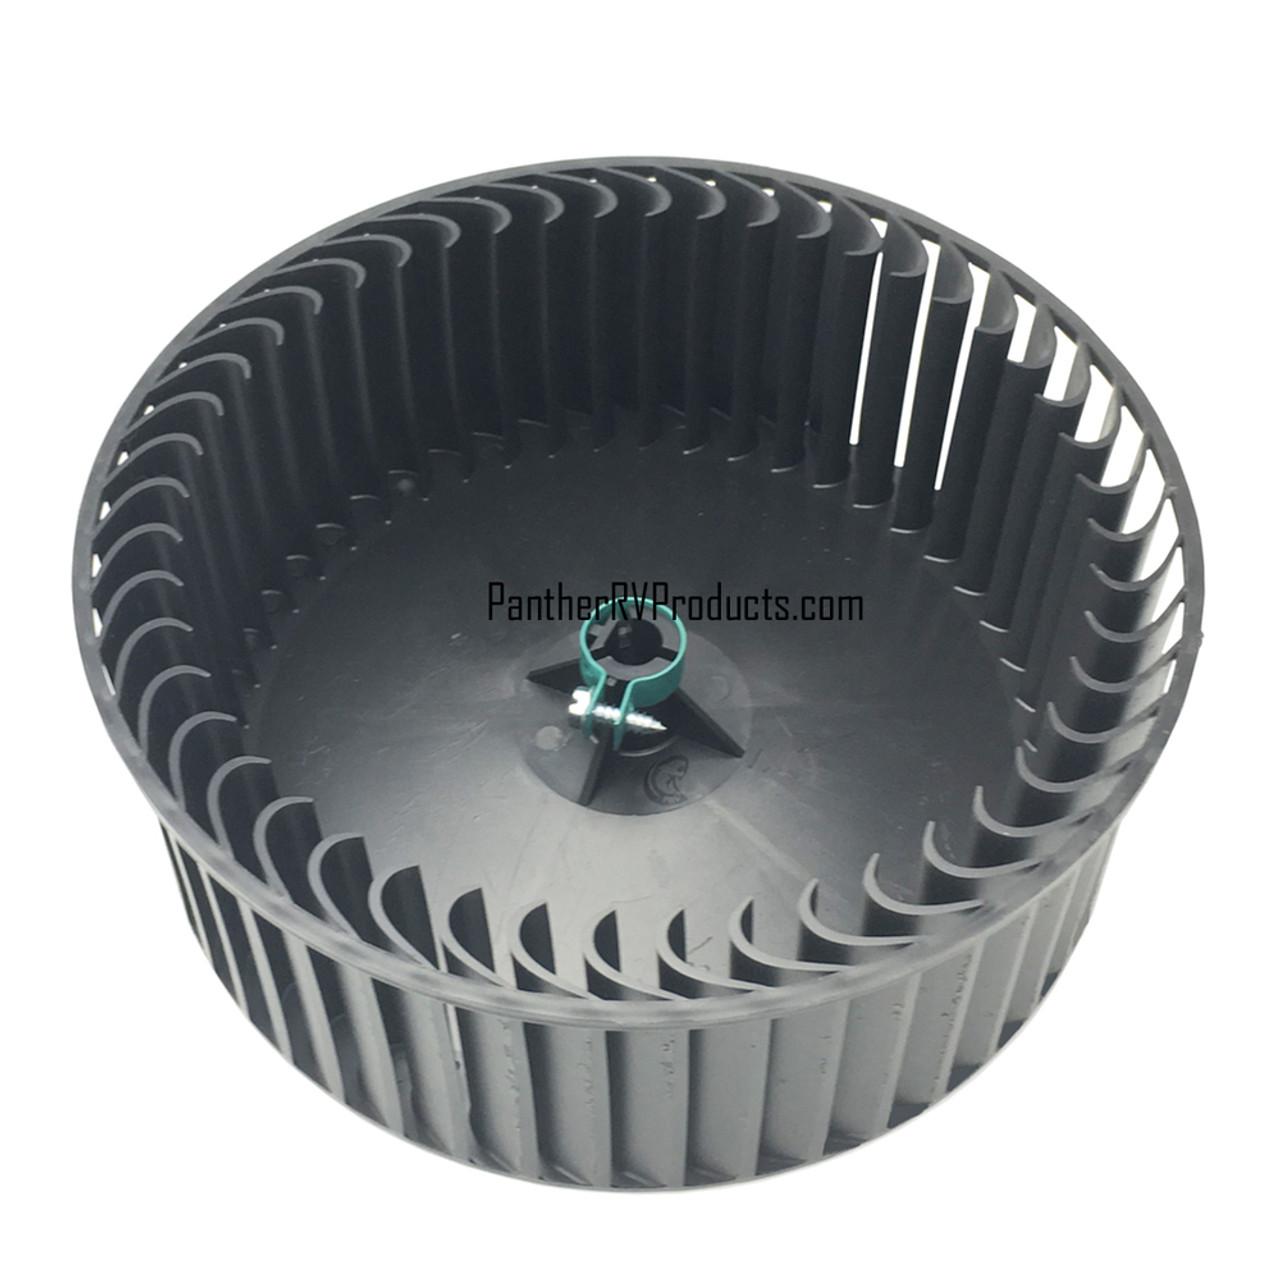 "Bay window airfilter camper // kadron 1.7-2.0 twin carbs con 25//8/"" diameter"